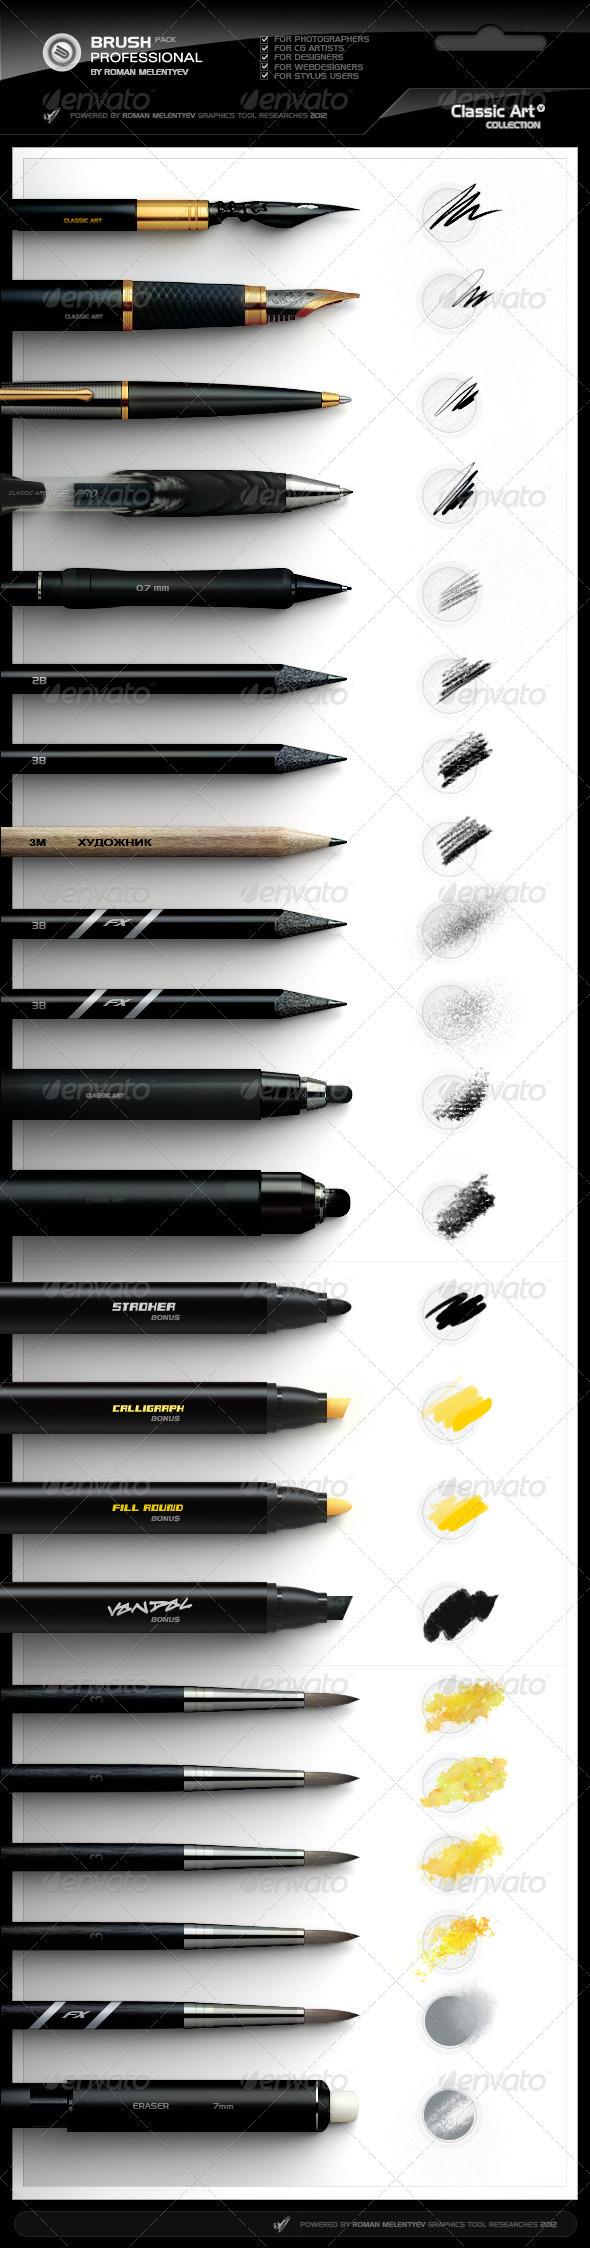 GraphicRiver Brush Pack Professional volume 4 Classic Art 2476826